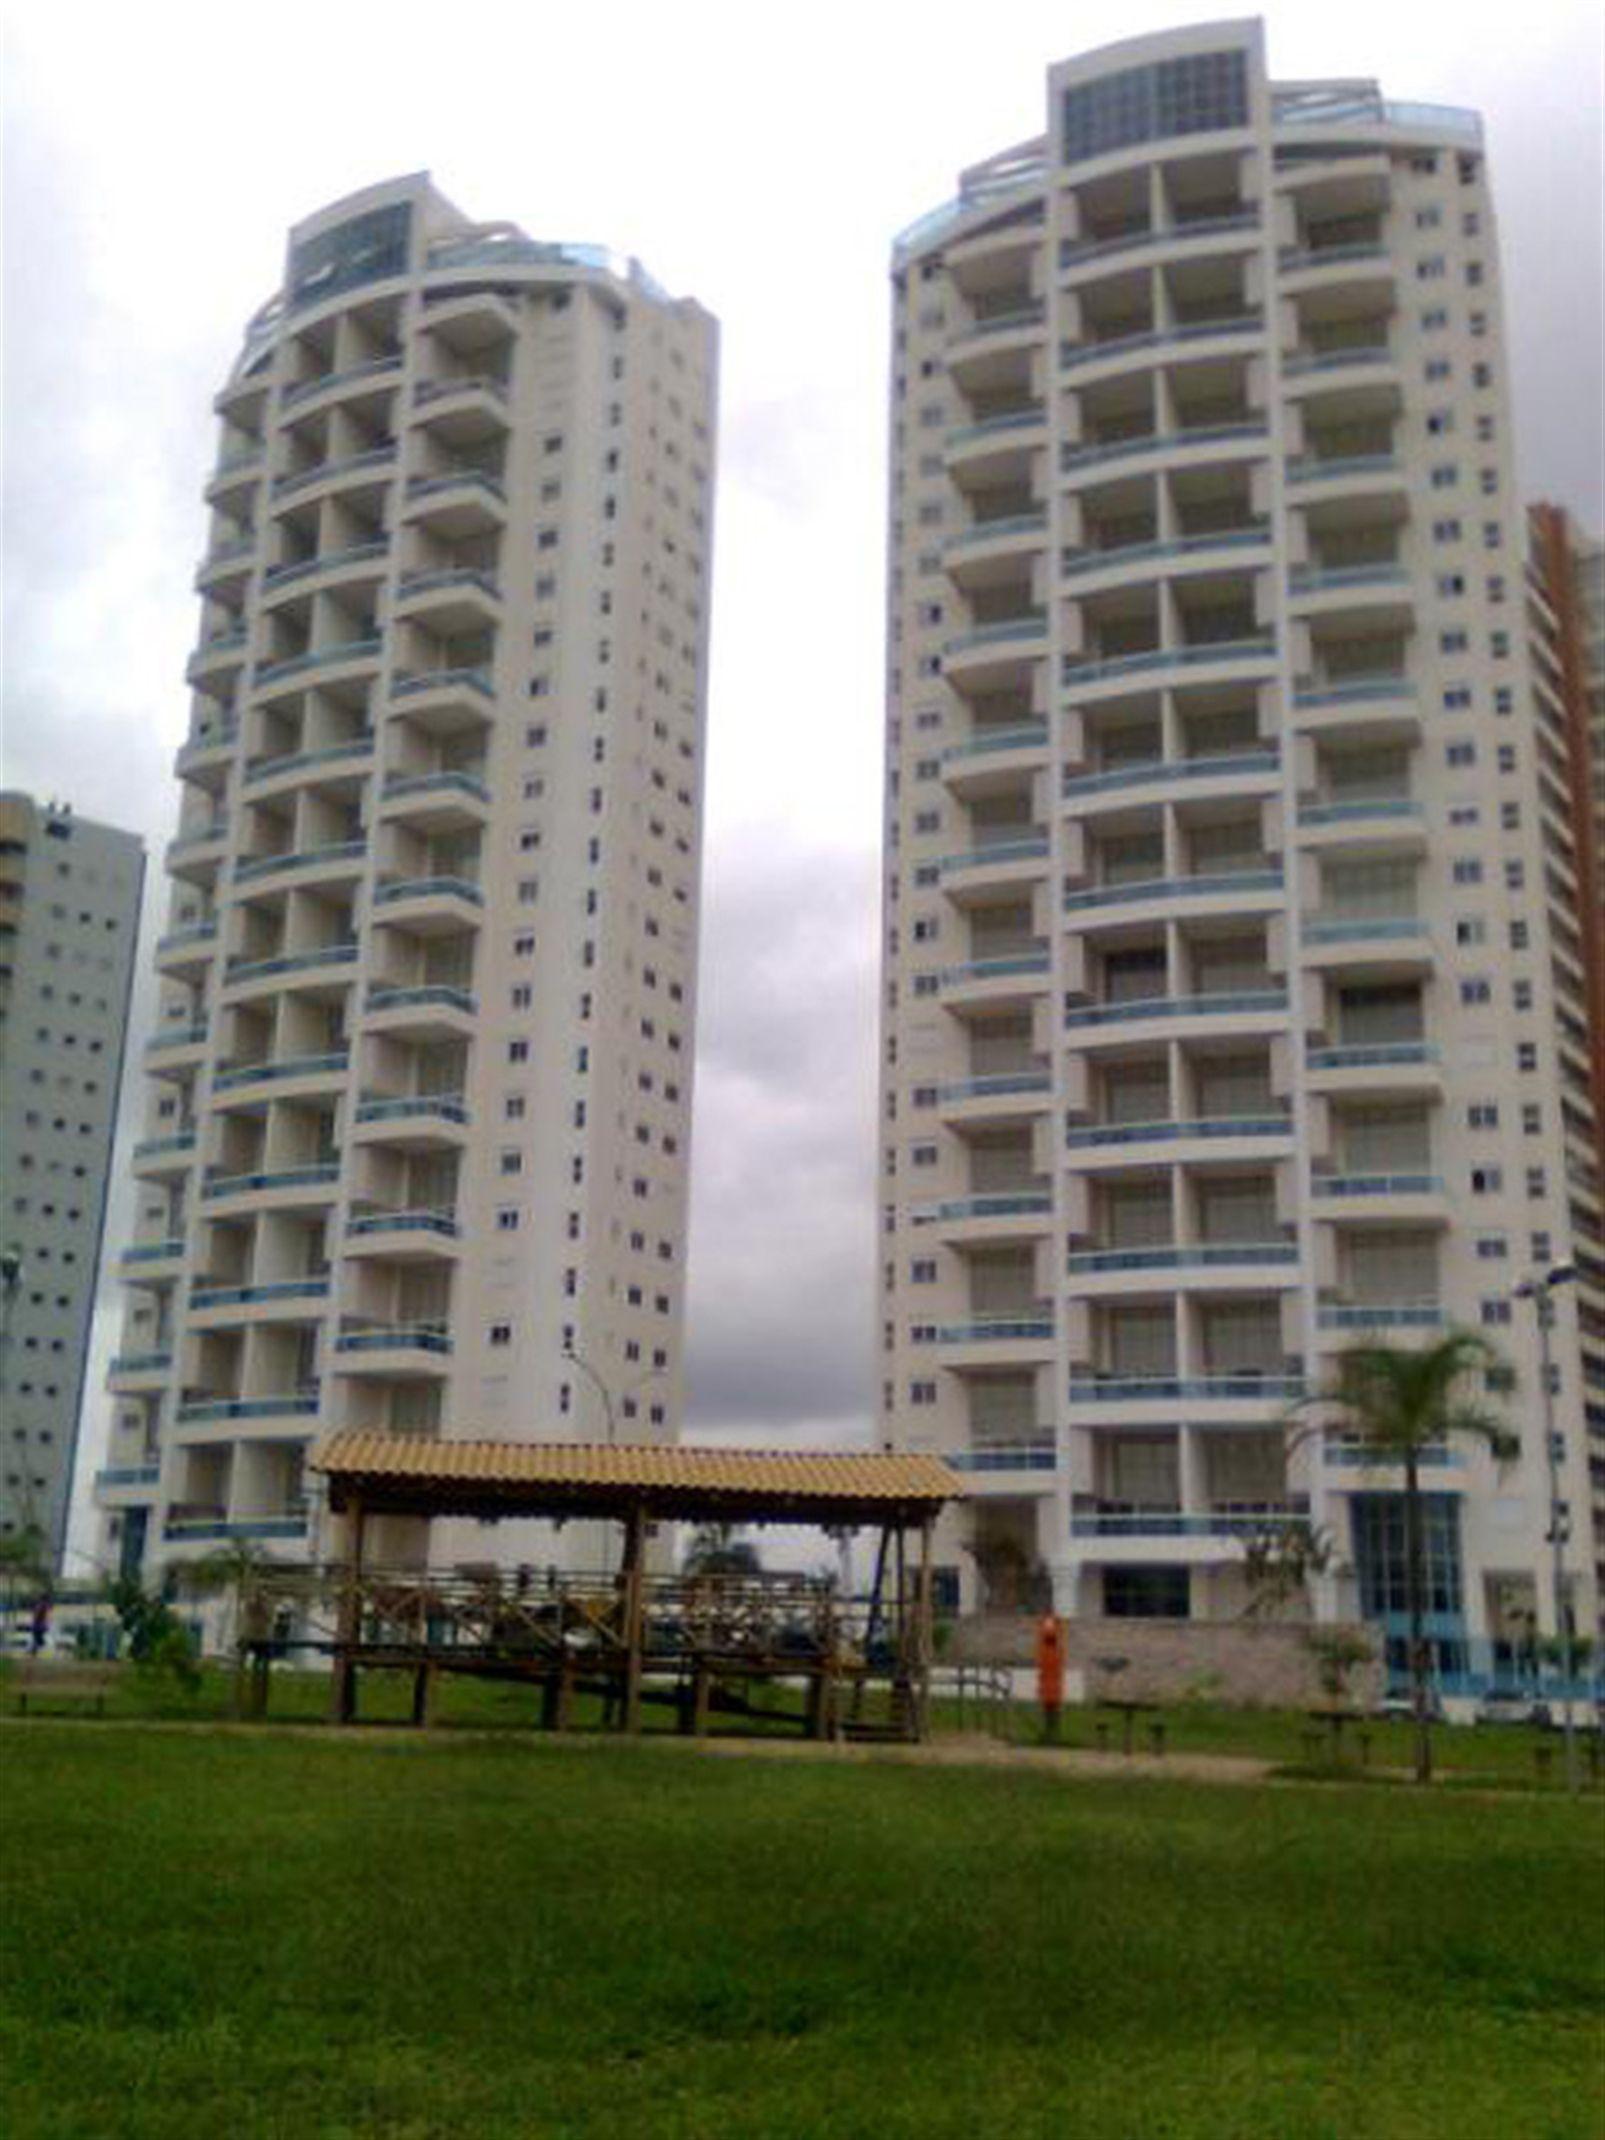 Imóvel pronto   Reserva Grann Parc – Apartamentono  Jardim Goiás - Goiânia - Goiás